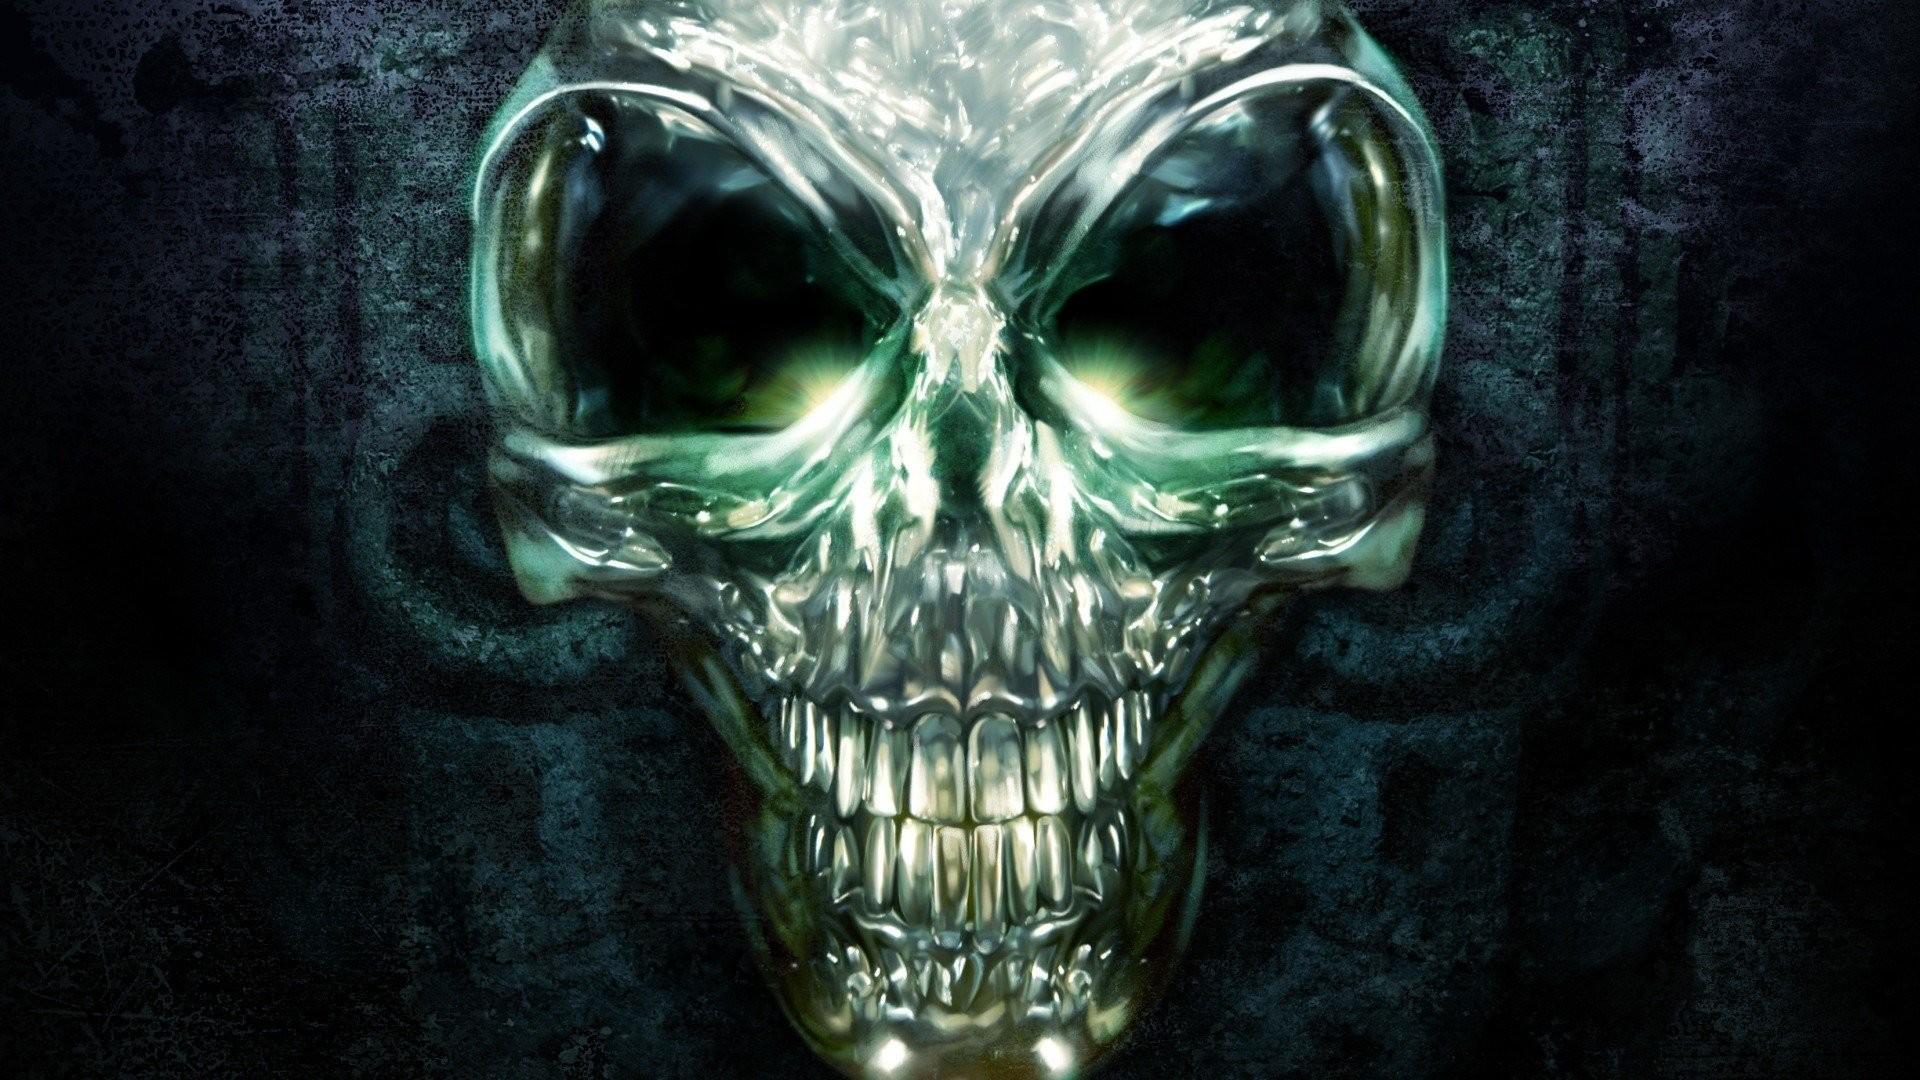 evil demon skulls wallpaper - photo #12